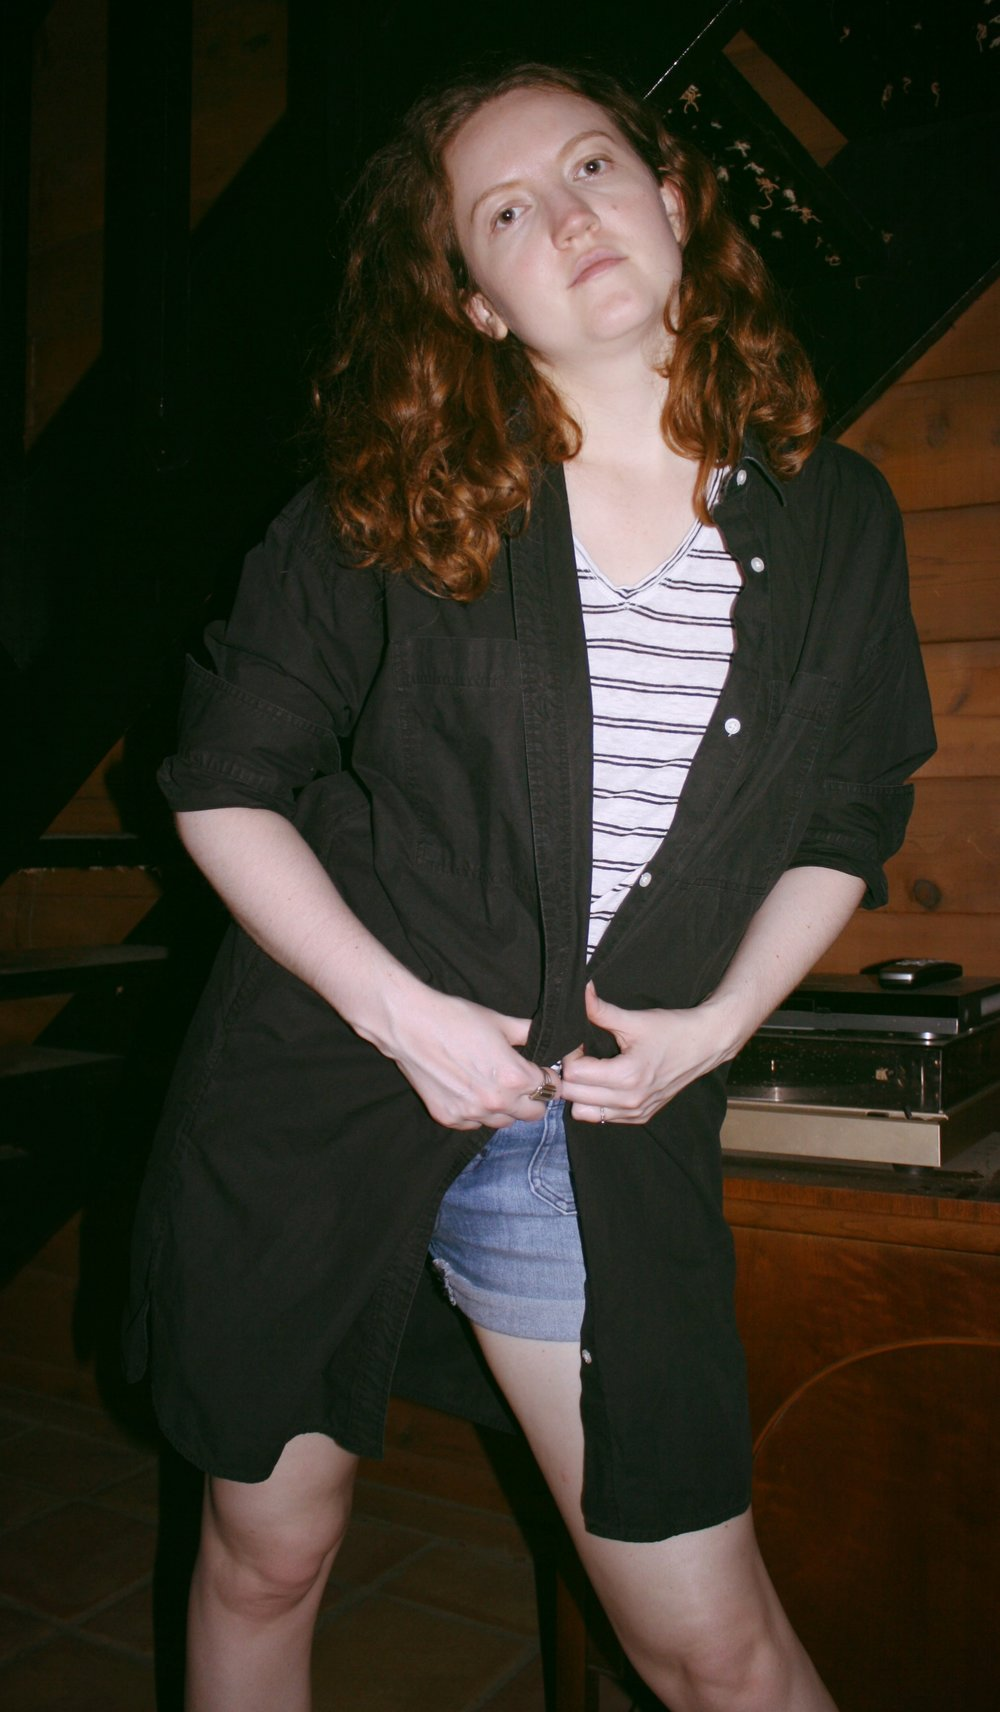 Everlane cotton two pocket shirt dress in Black + LOFT Striped Linen Tee + Madewell Shorts